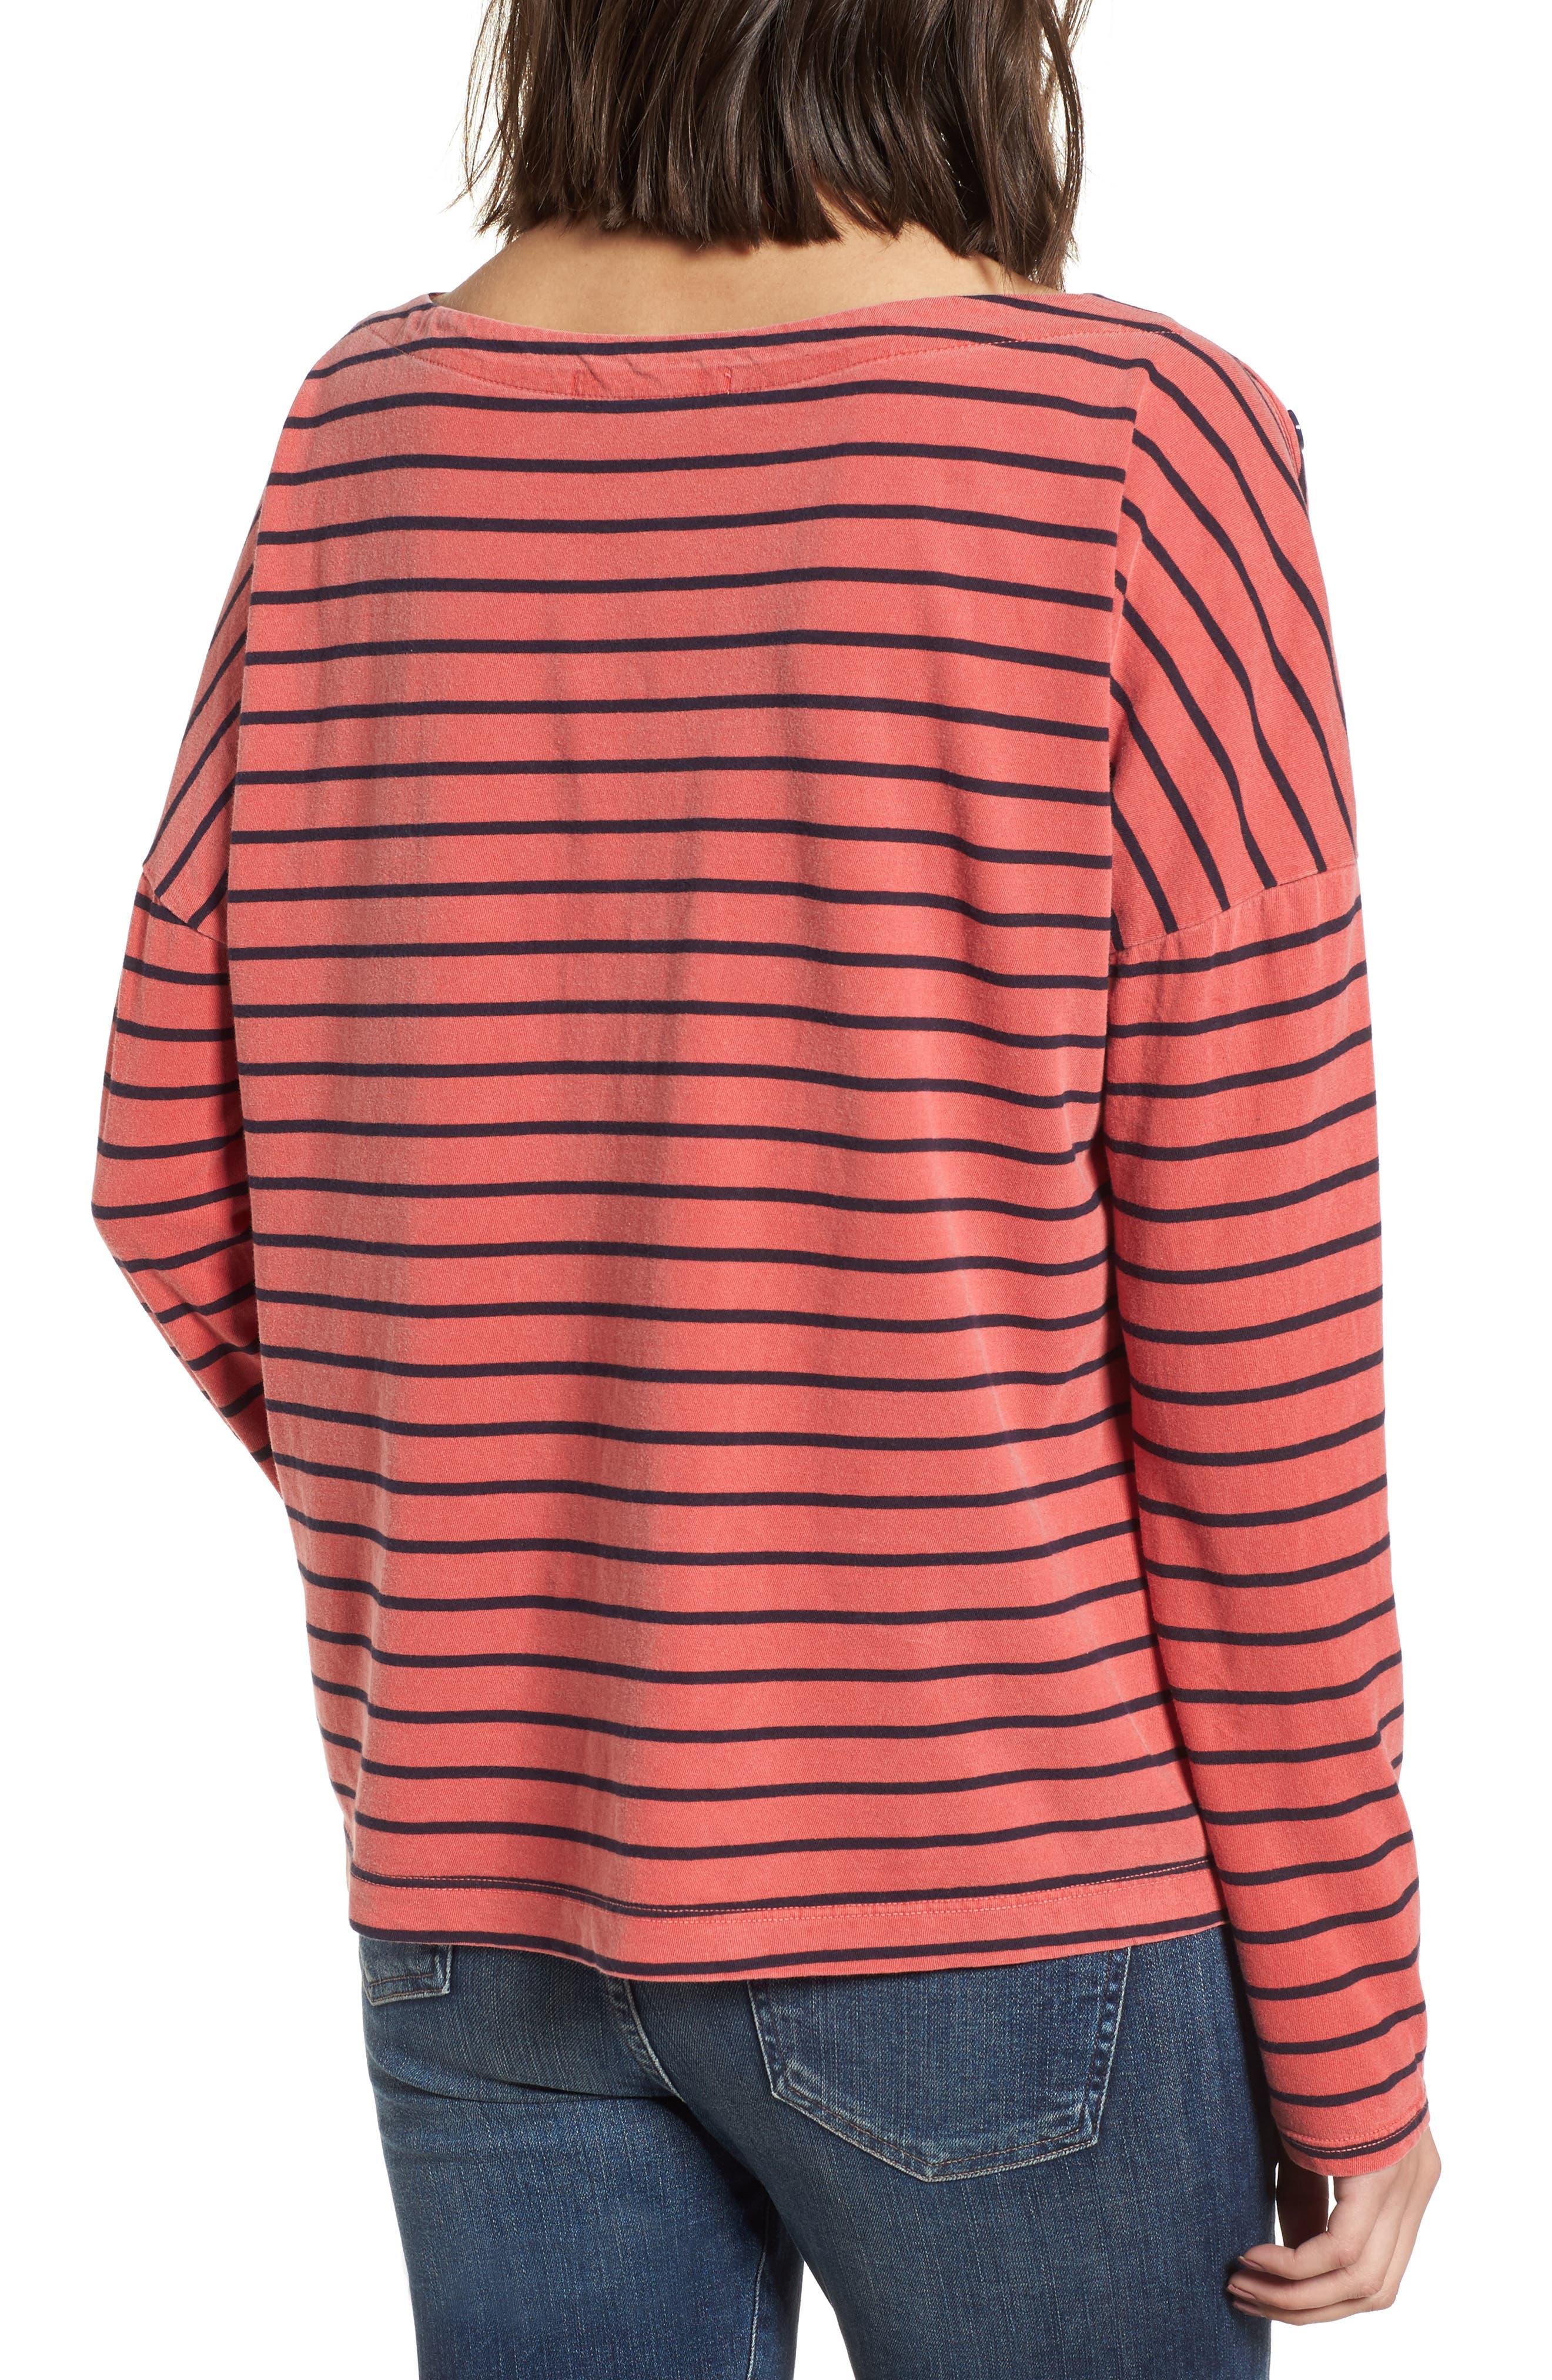 Stripe Button Tee,                             Alternate thumbnail 2, color,                             Chili